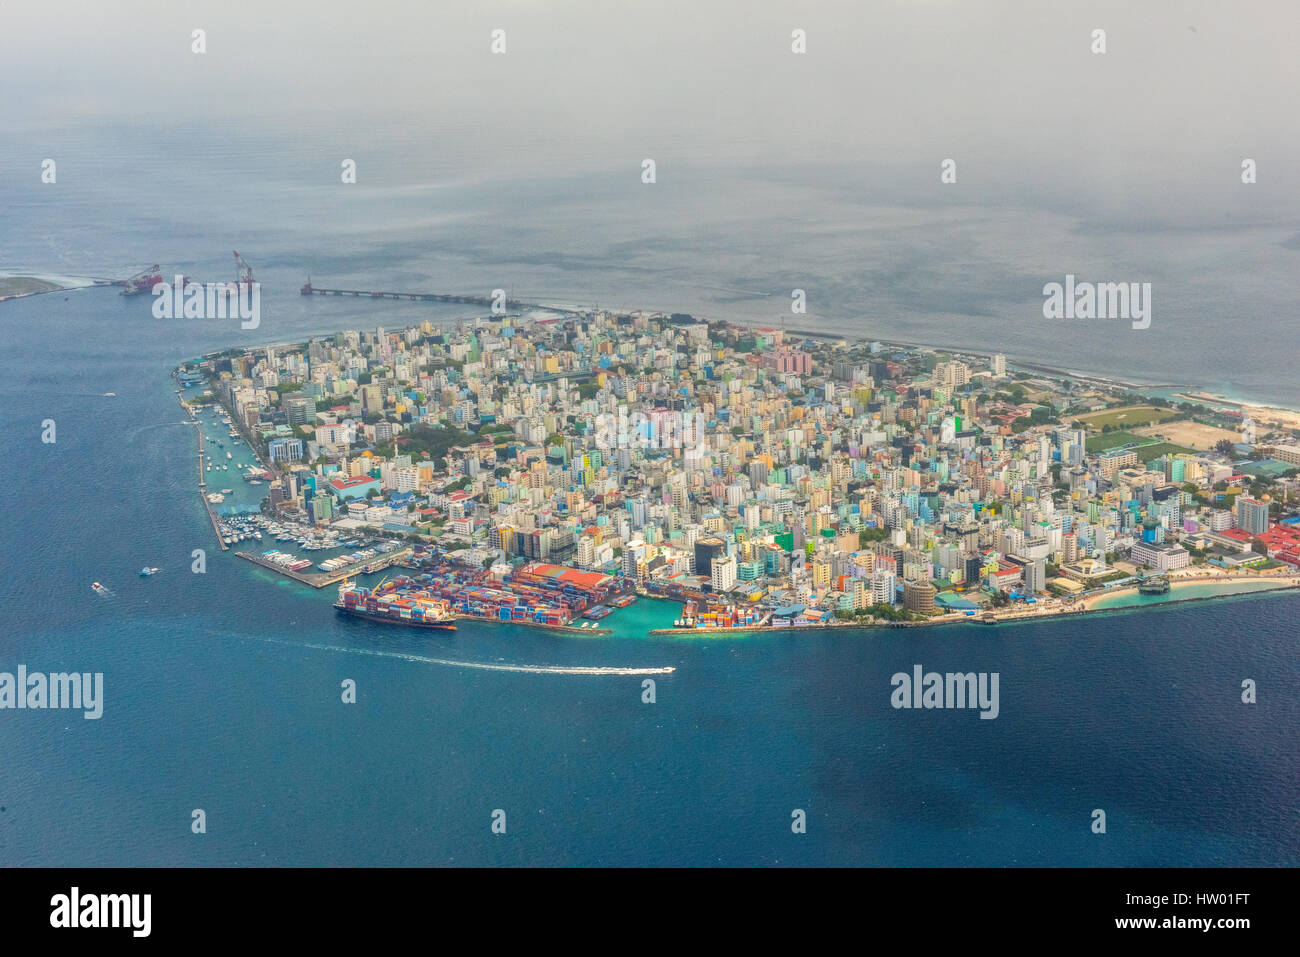 male maldives aerial stockfotos male maldives aerial bilder alamy. Black Bedroom Furniture Sets. Home Design Ideas